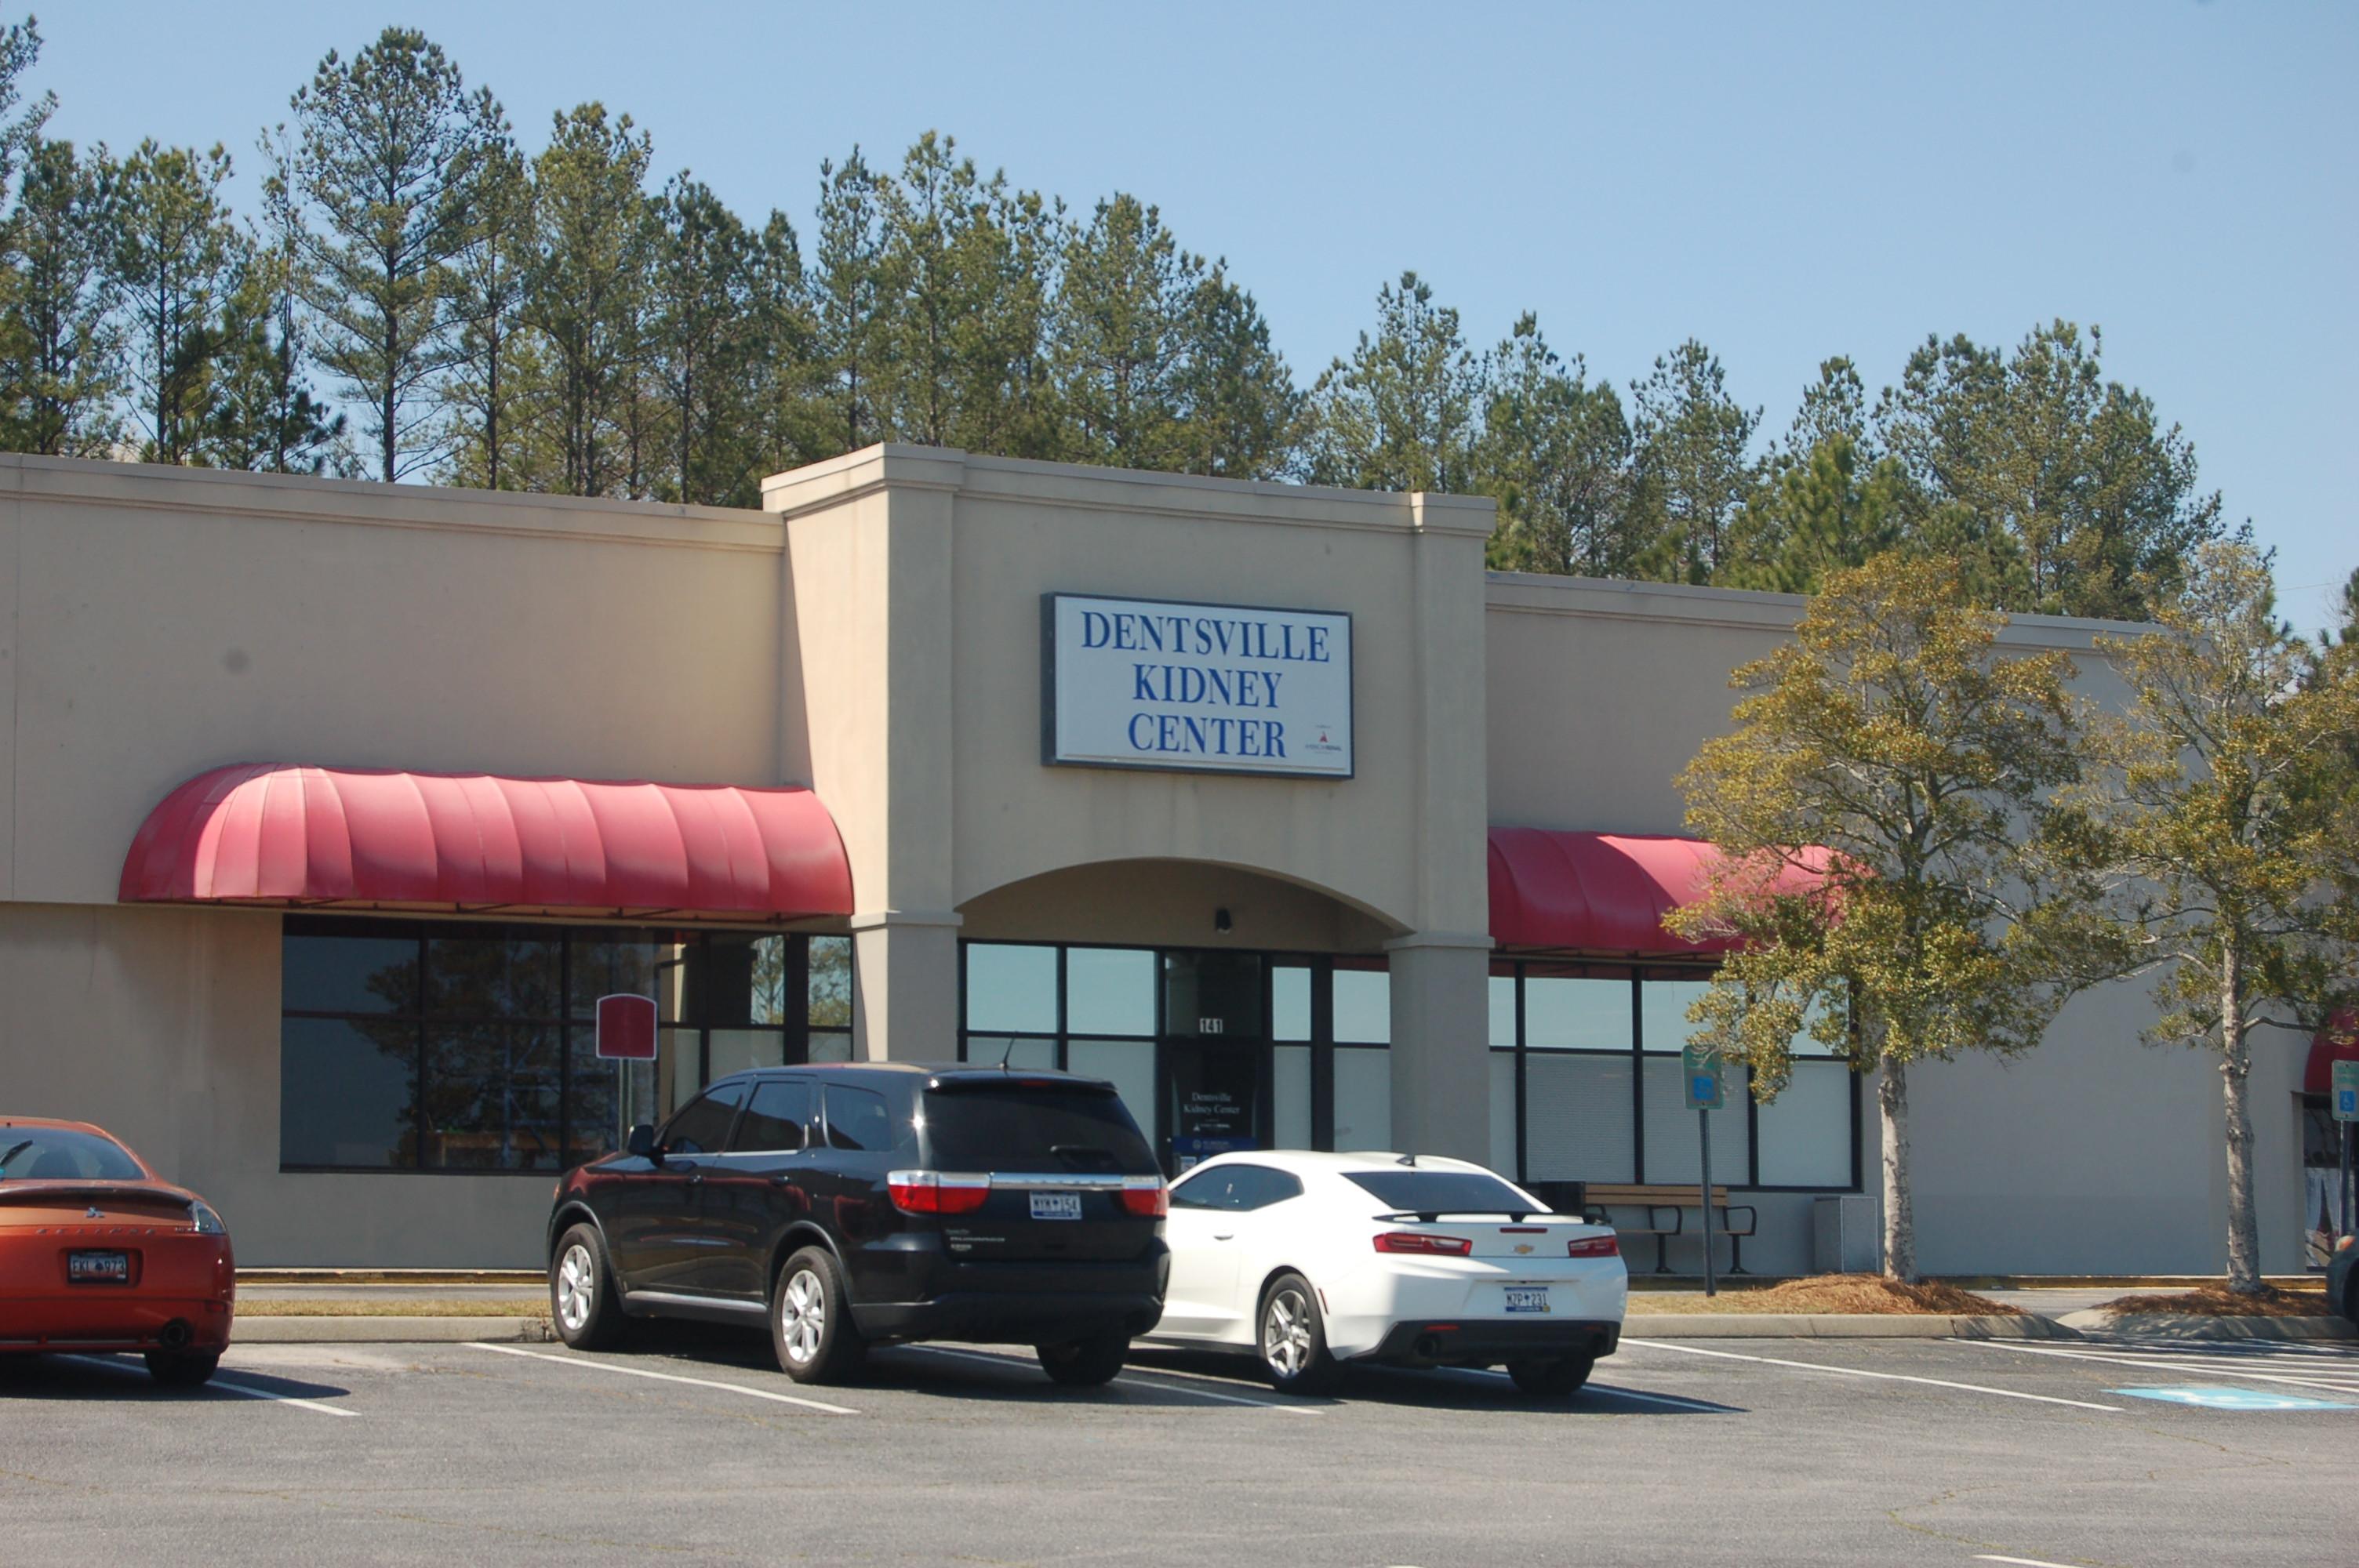 201 Columbia Mall Blvd,Columbia,South Carolina 29223,1 BathroomBathrooms,Office,Columbia Mall Blvd,1238